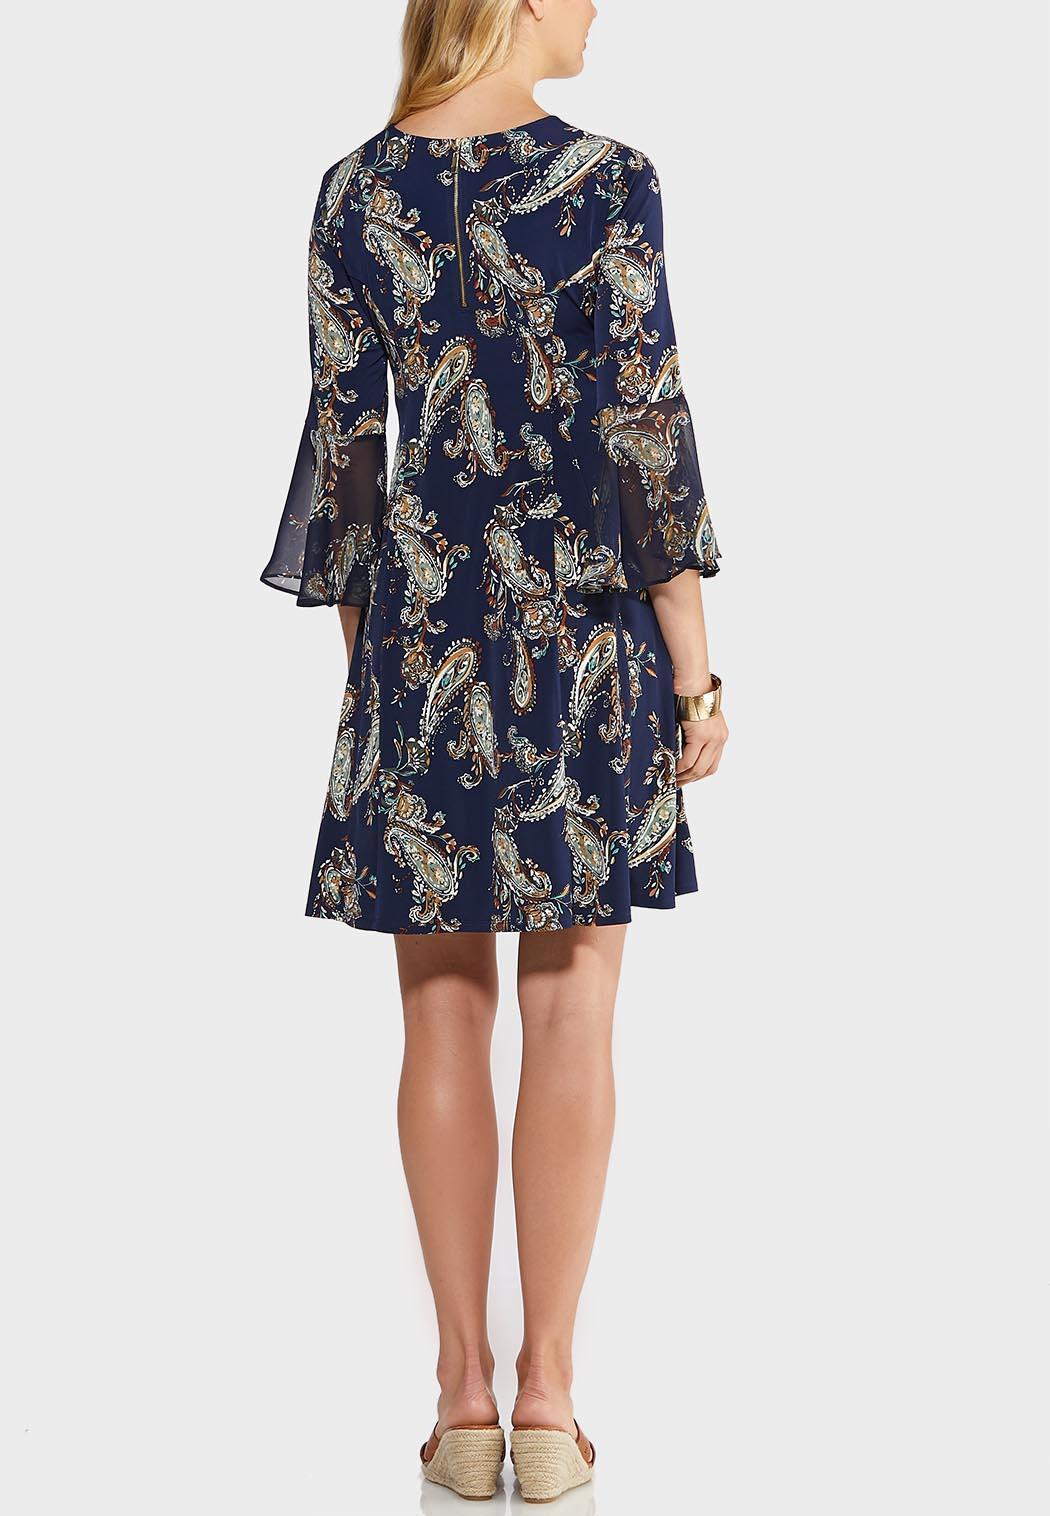 Plus Size Paisley Bell Sleeve Swing Dress (Item #43947580)